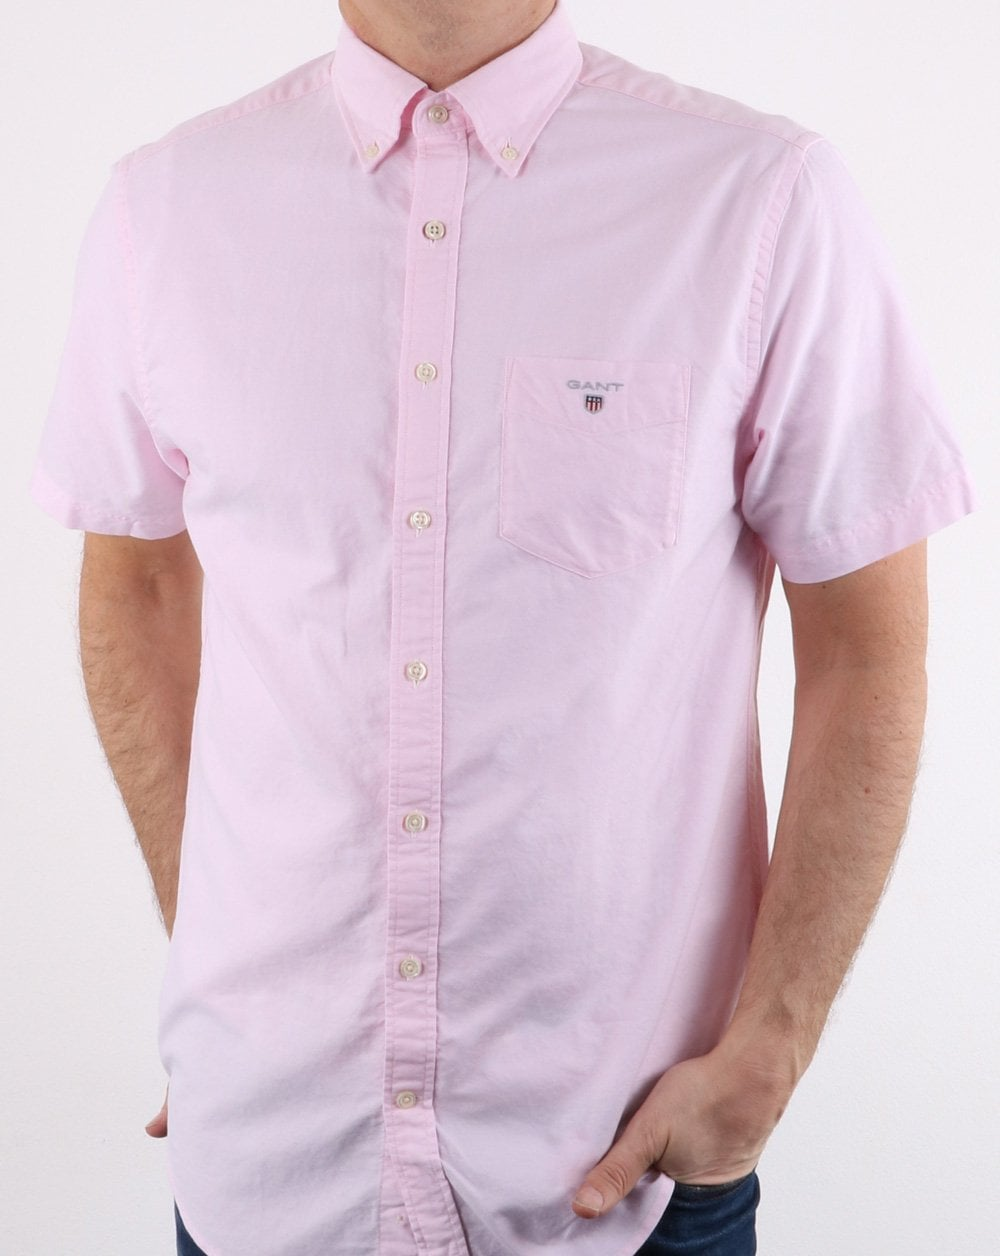 0ed649f8c Gant The Oxford Shirt Reg Short Sleeve Shirt Light Pink